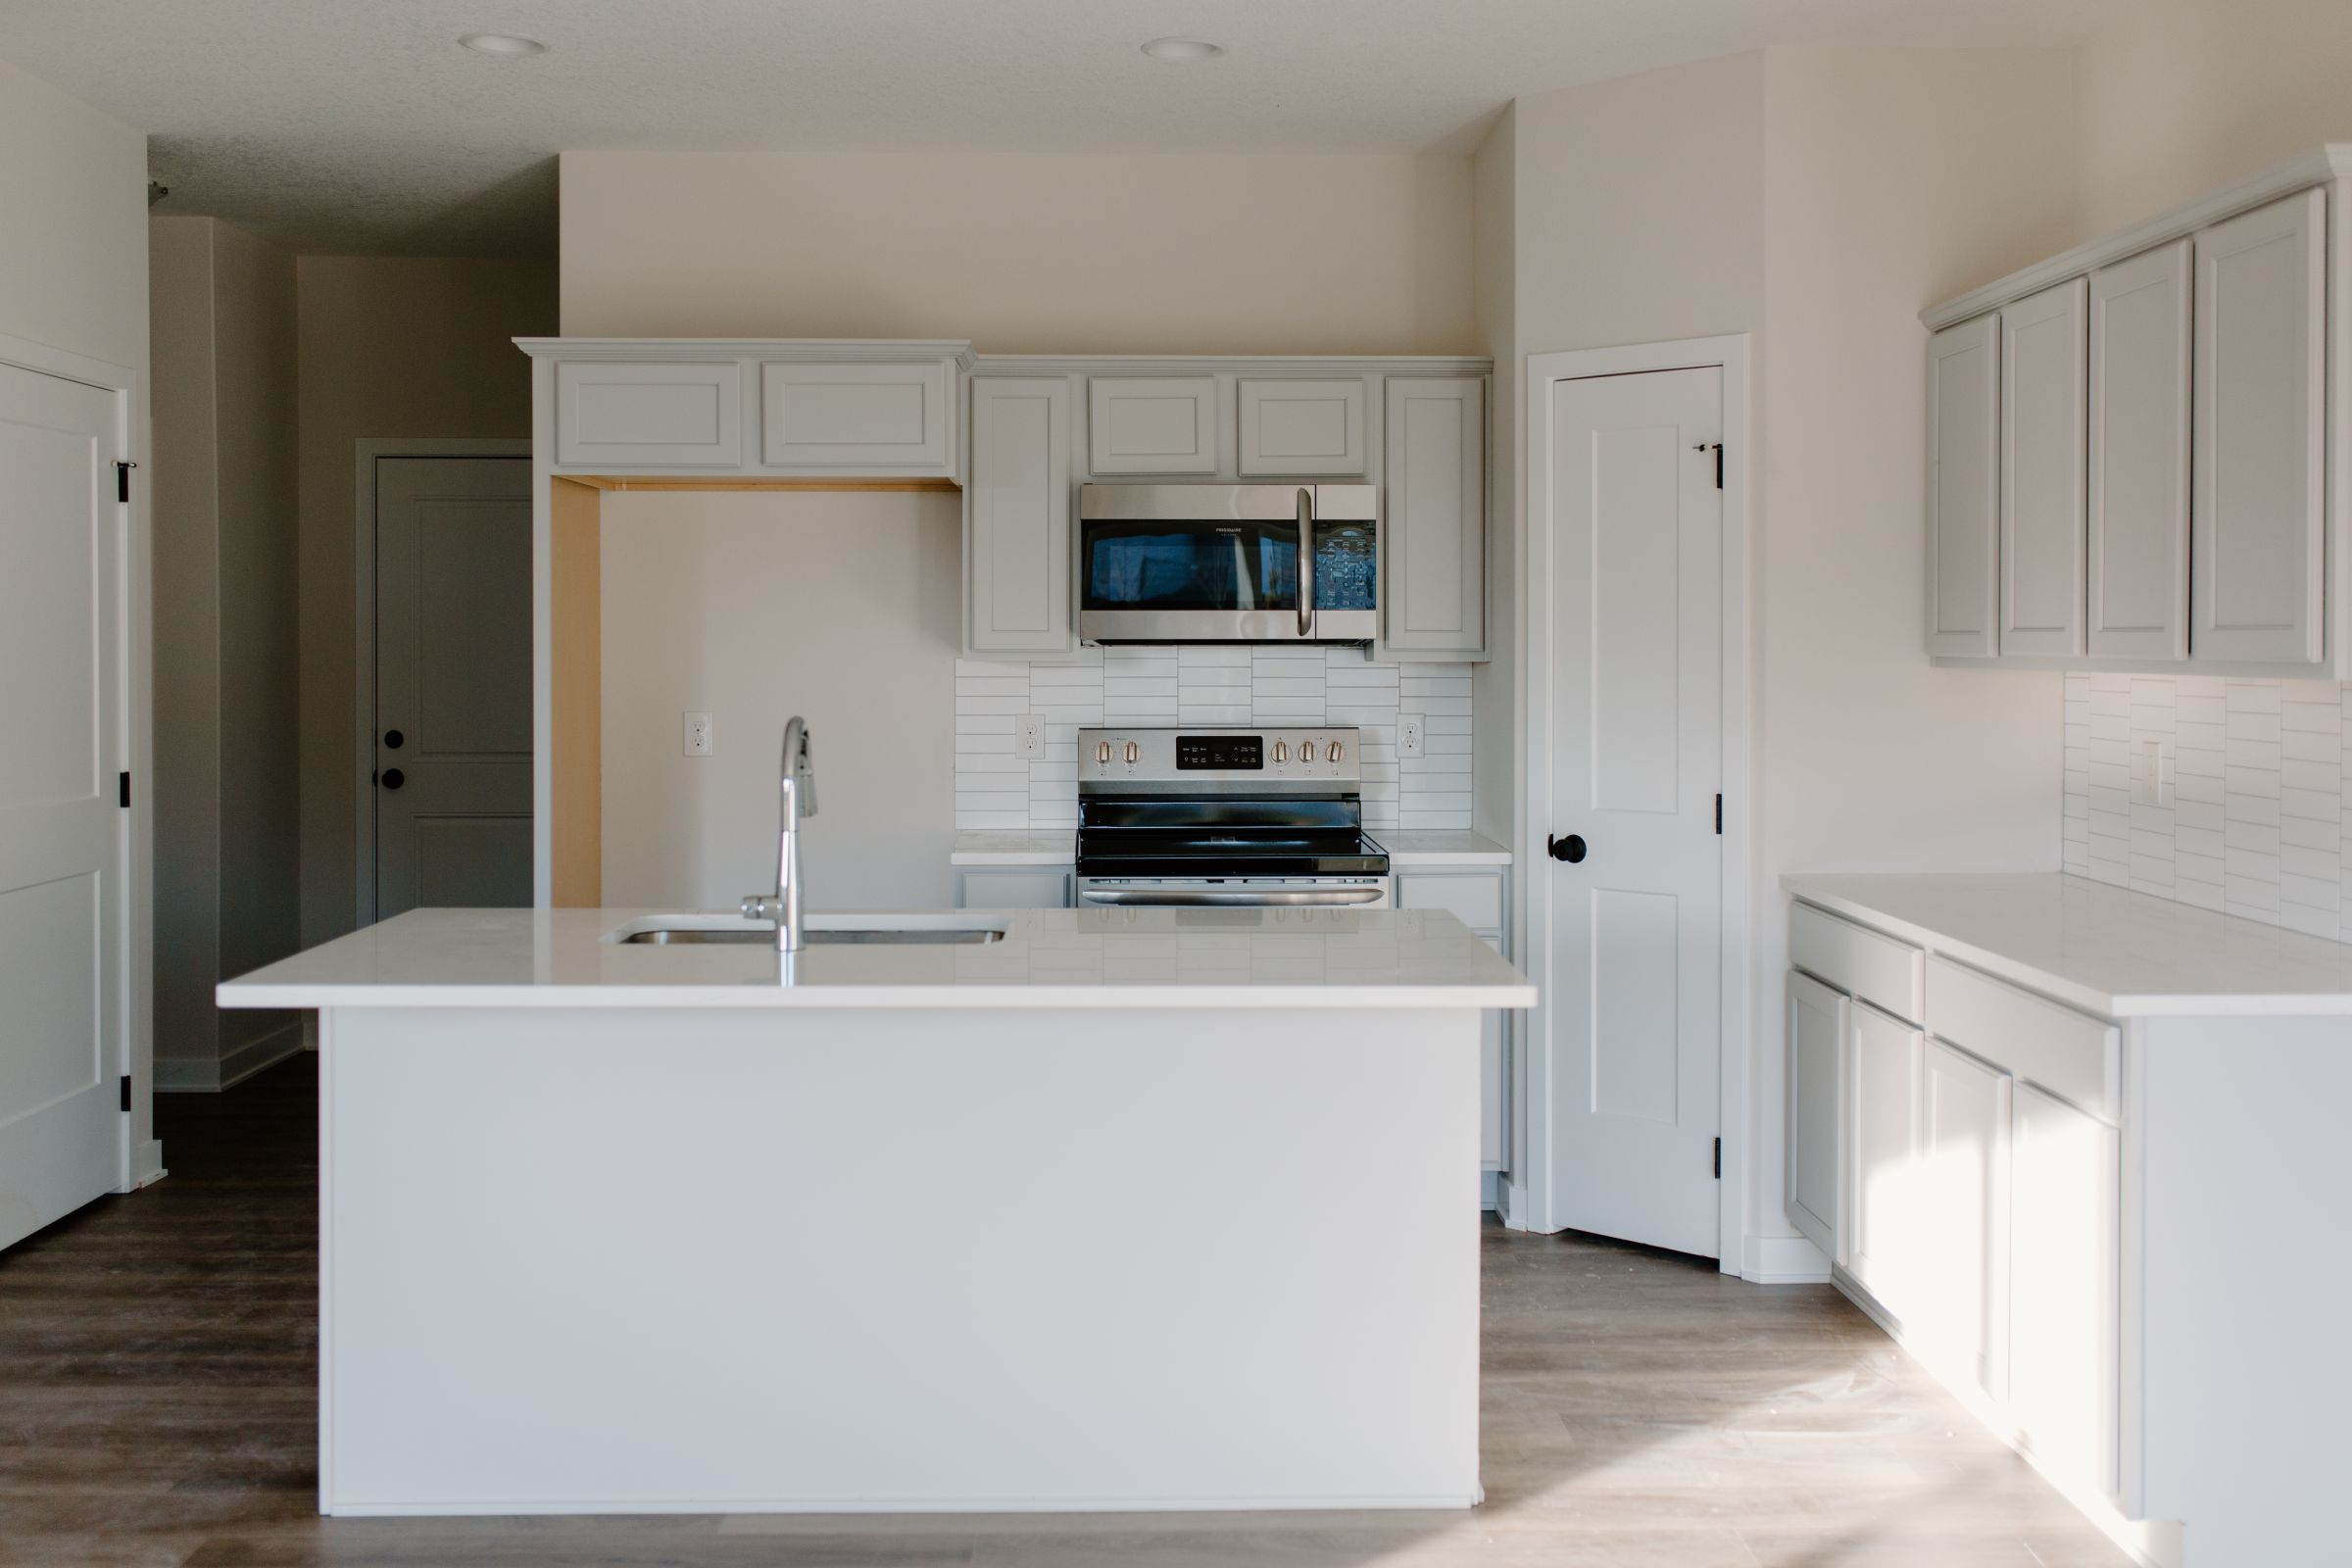 residential-warren-county-iowa-0-acres-listing-number-15138-1-2020-12-28-170542.jpg